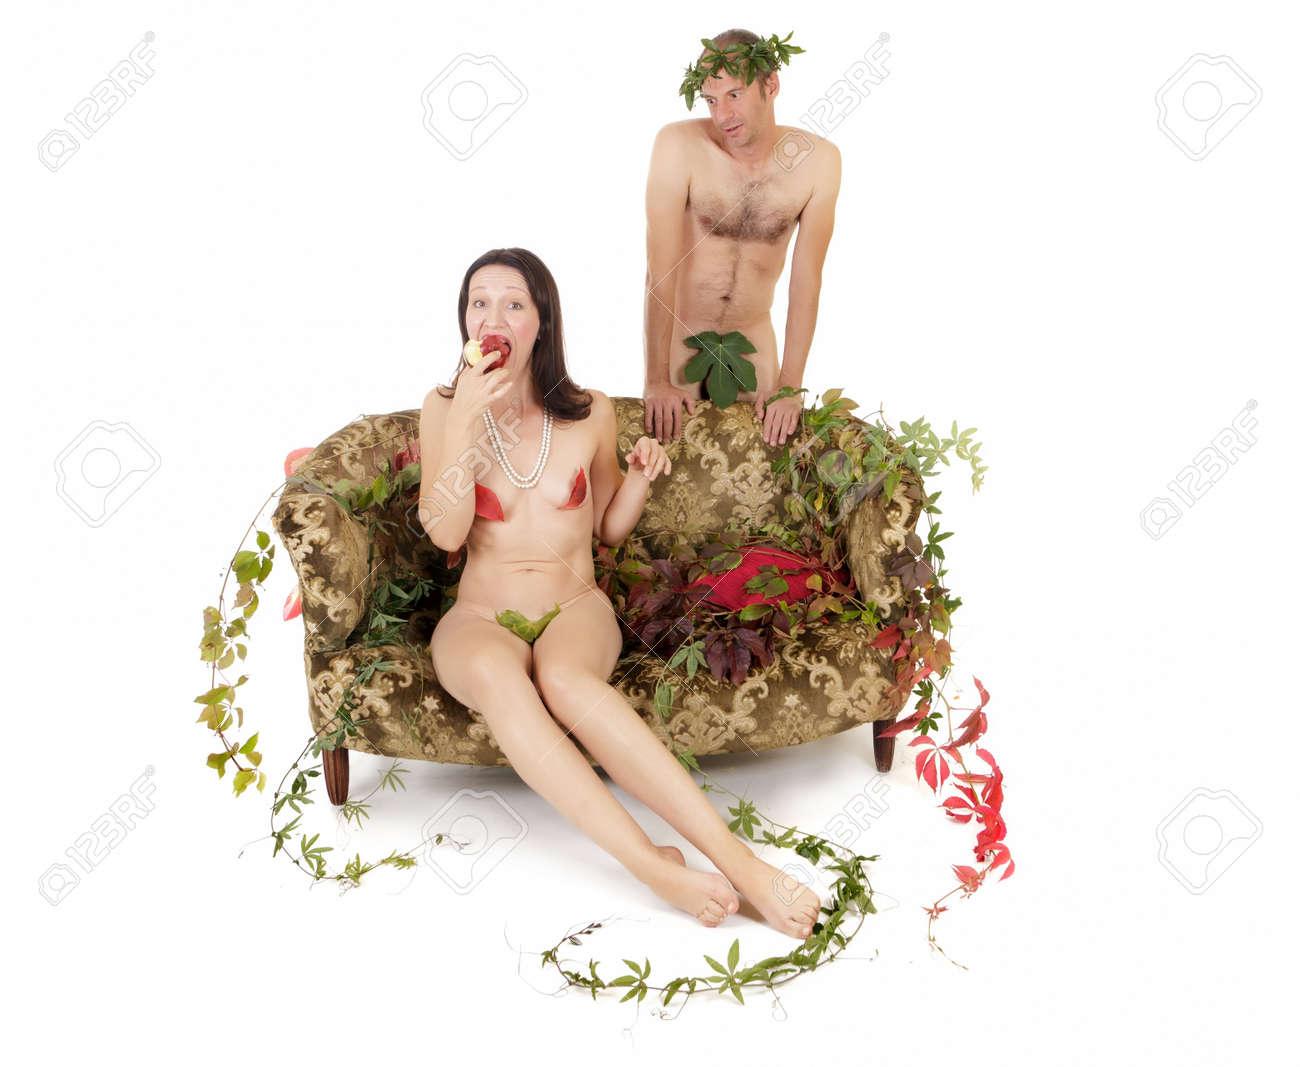 kitsch couple seduction on retro couch, original sin concept Stock Photo - 10995105